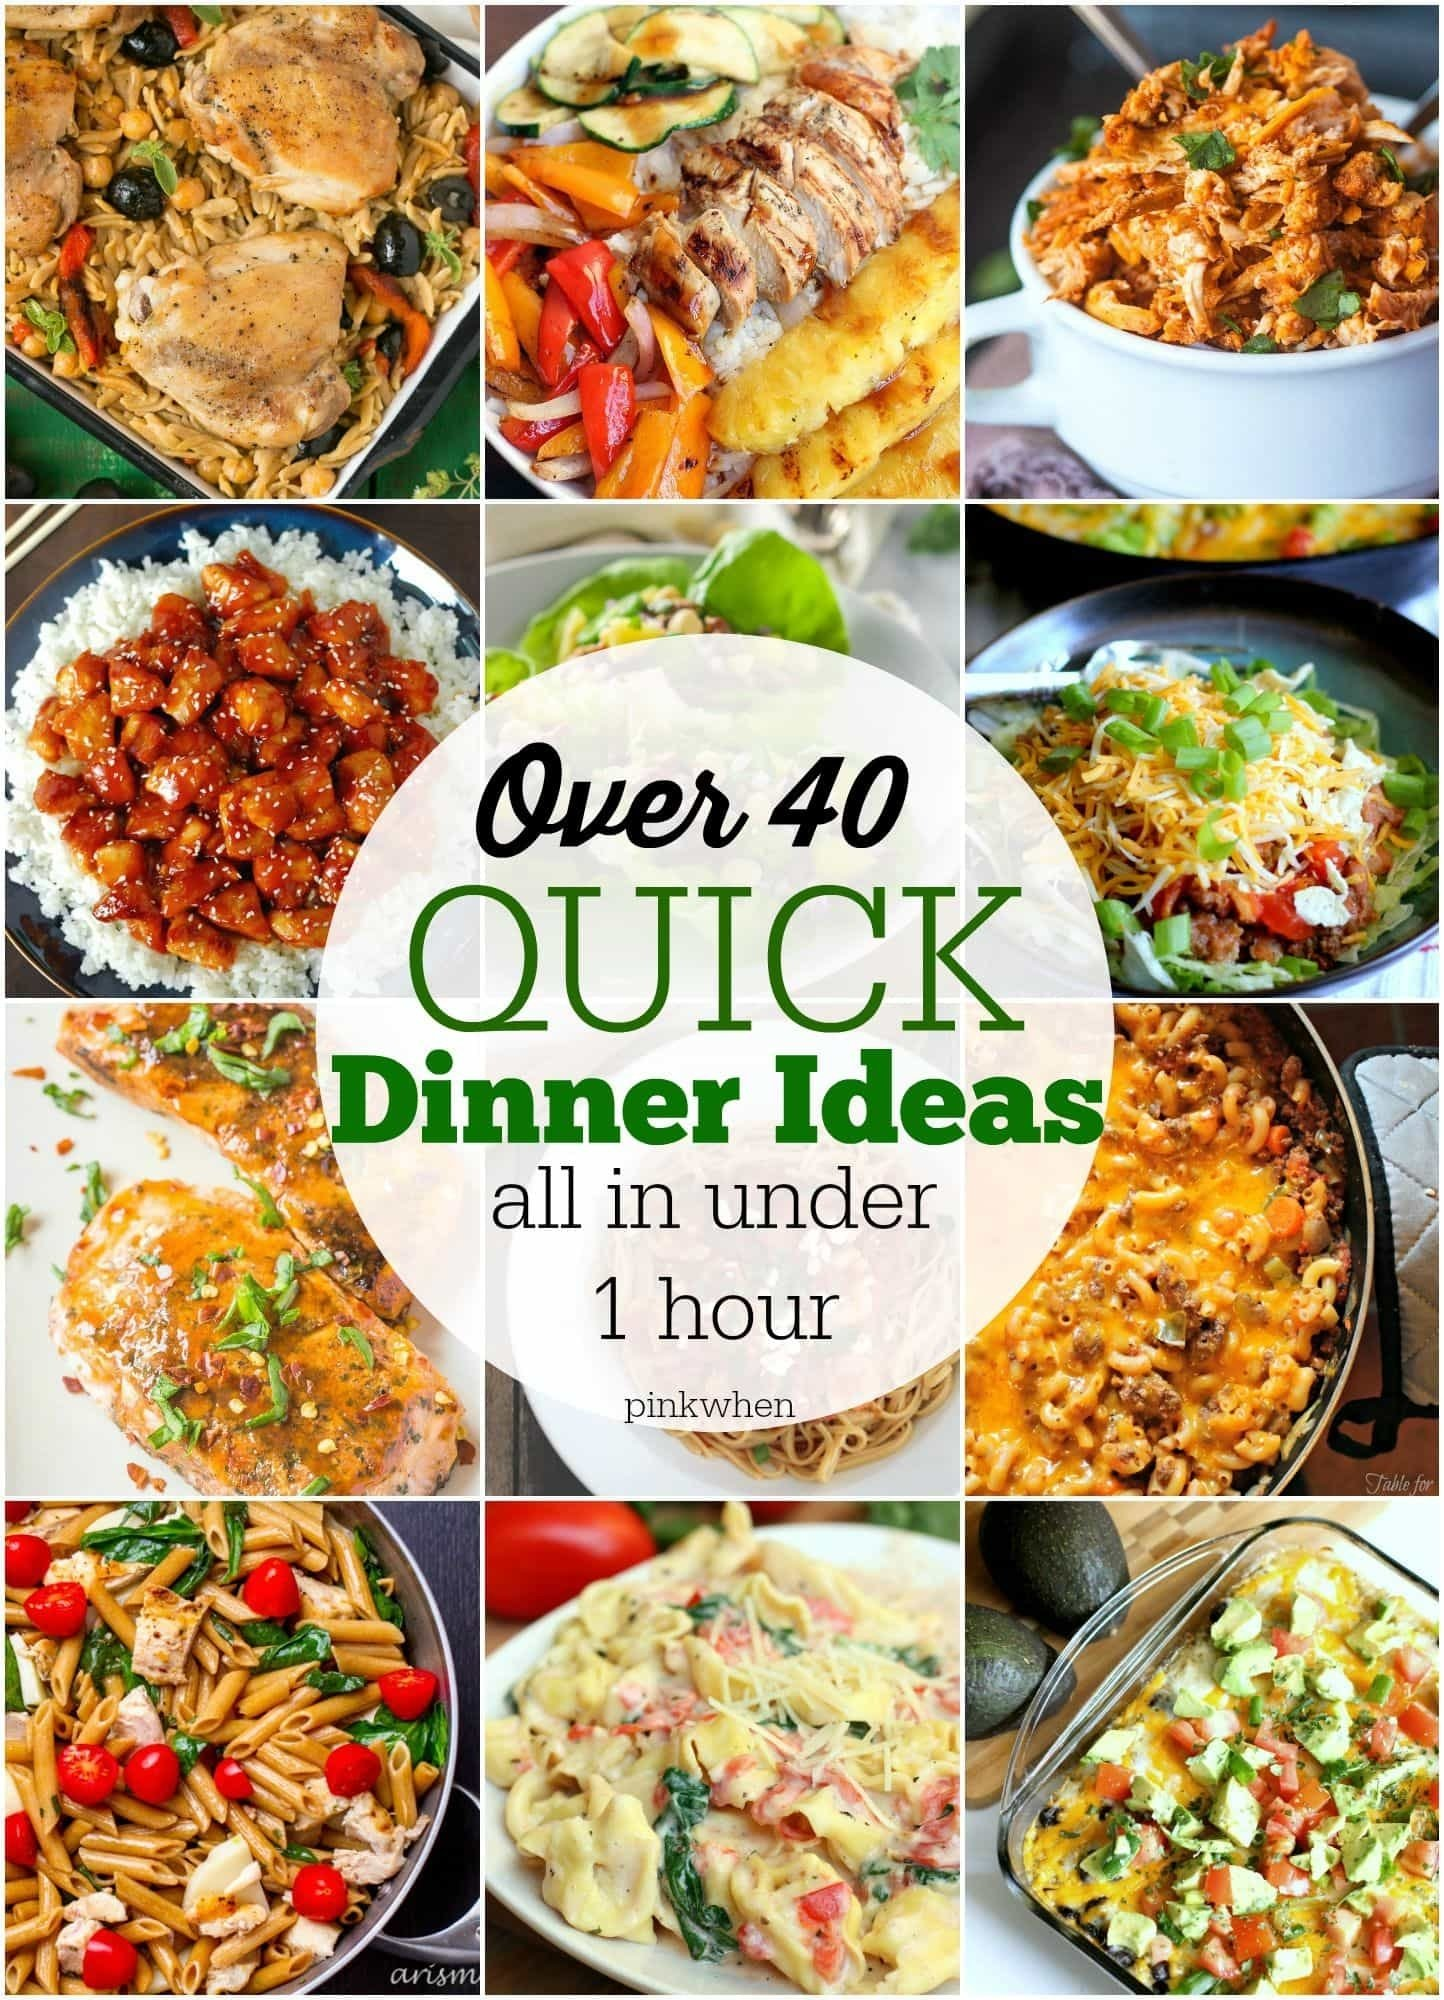 10 Ideal Ideas For A Quick Dinner 40 quick dinner ideas pinkwhen 1 2020